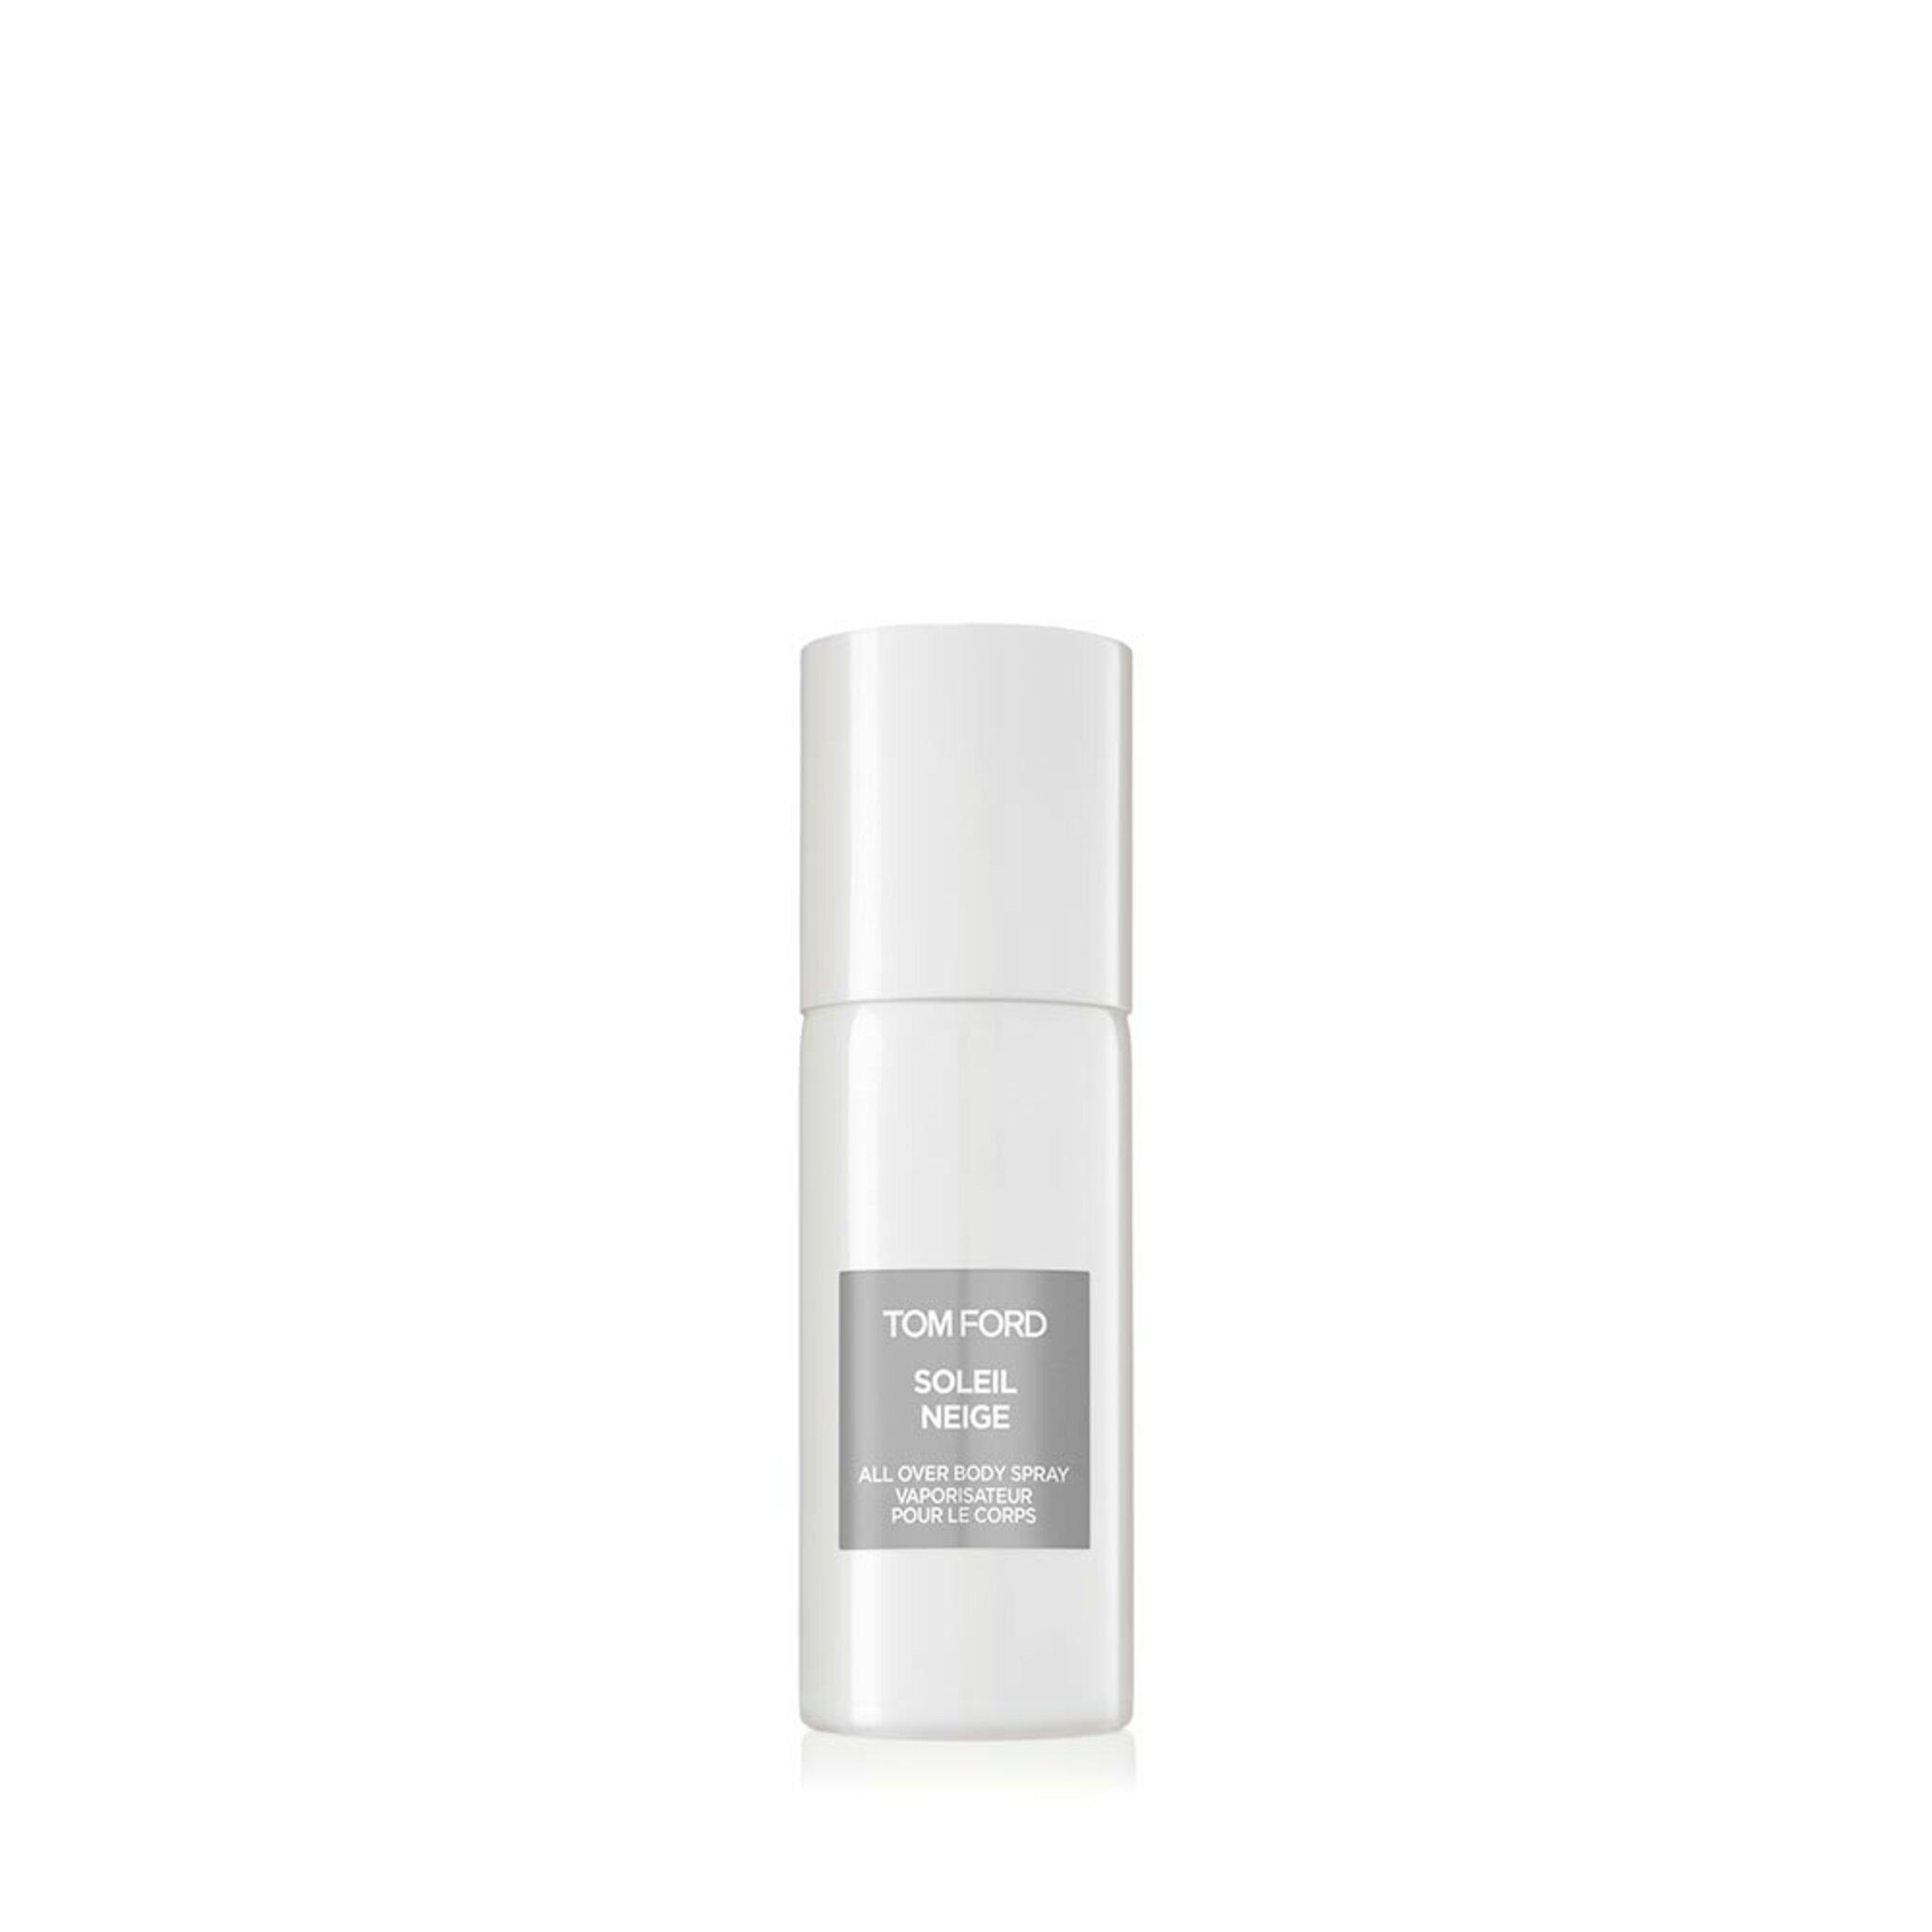 Soleil Neige All Over Body Spray, 150 ML